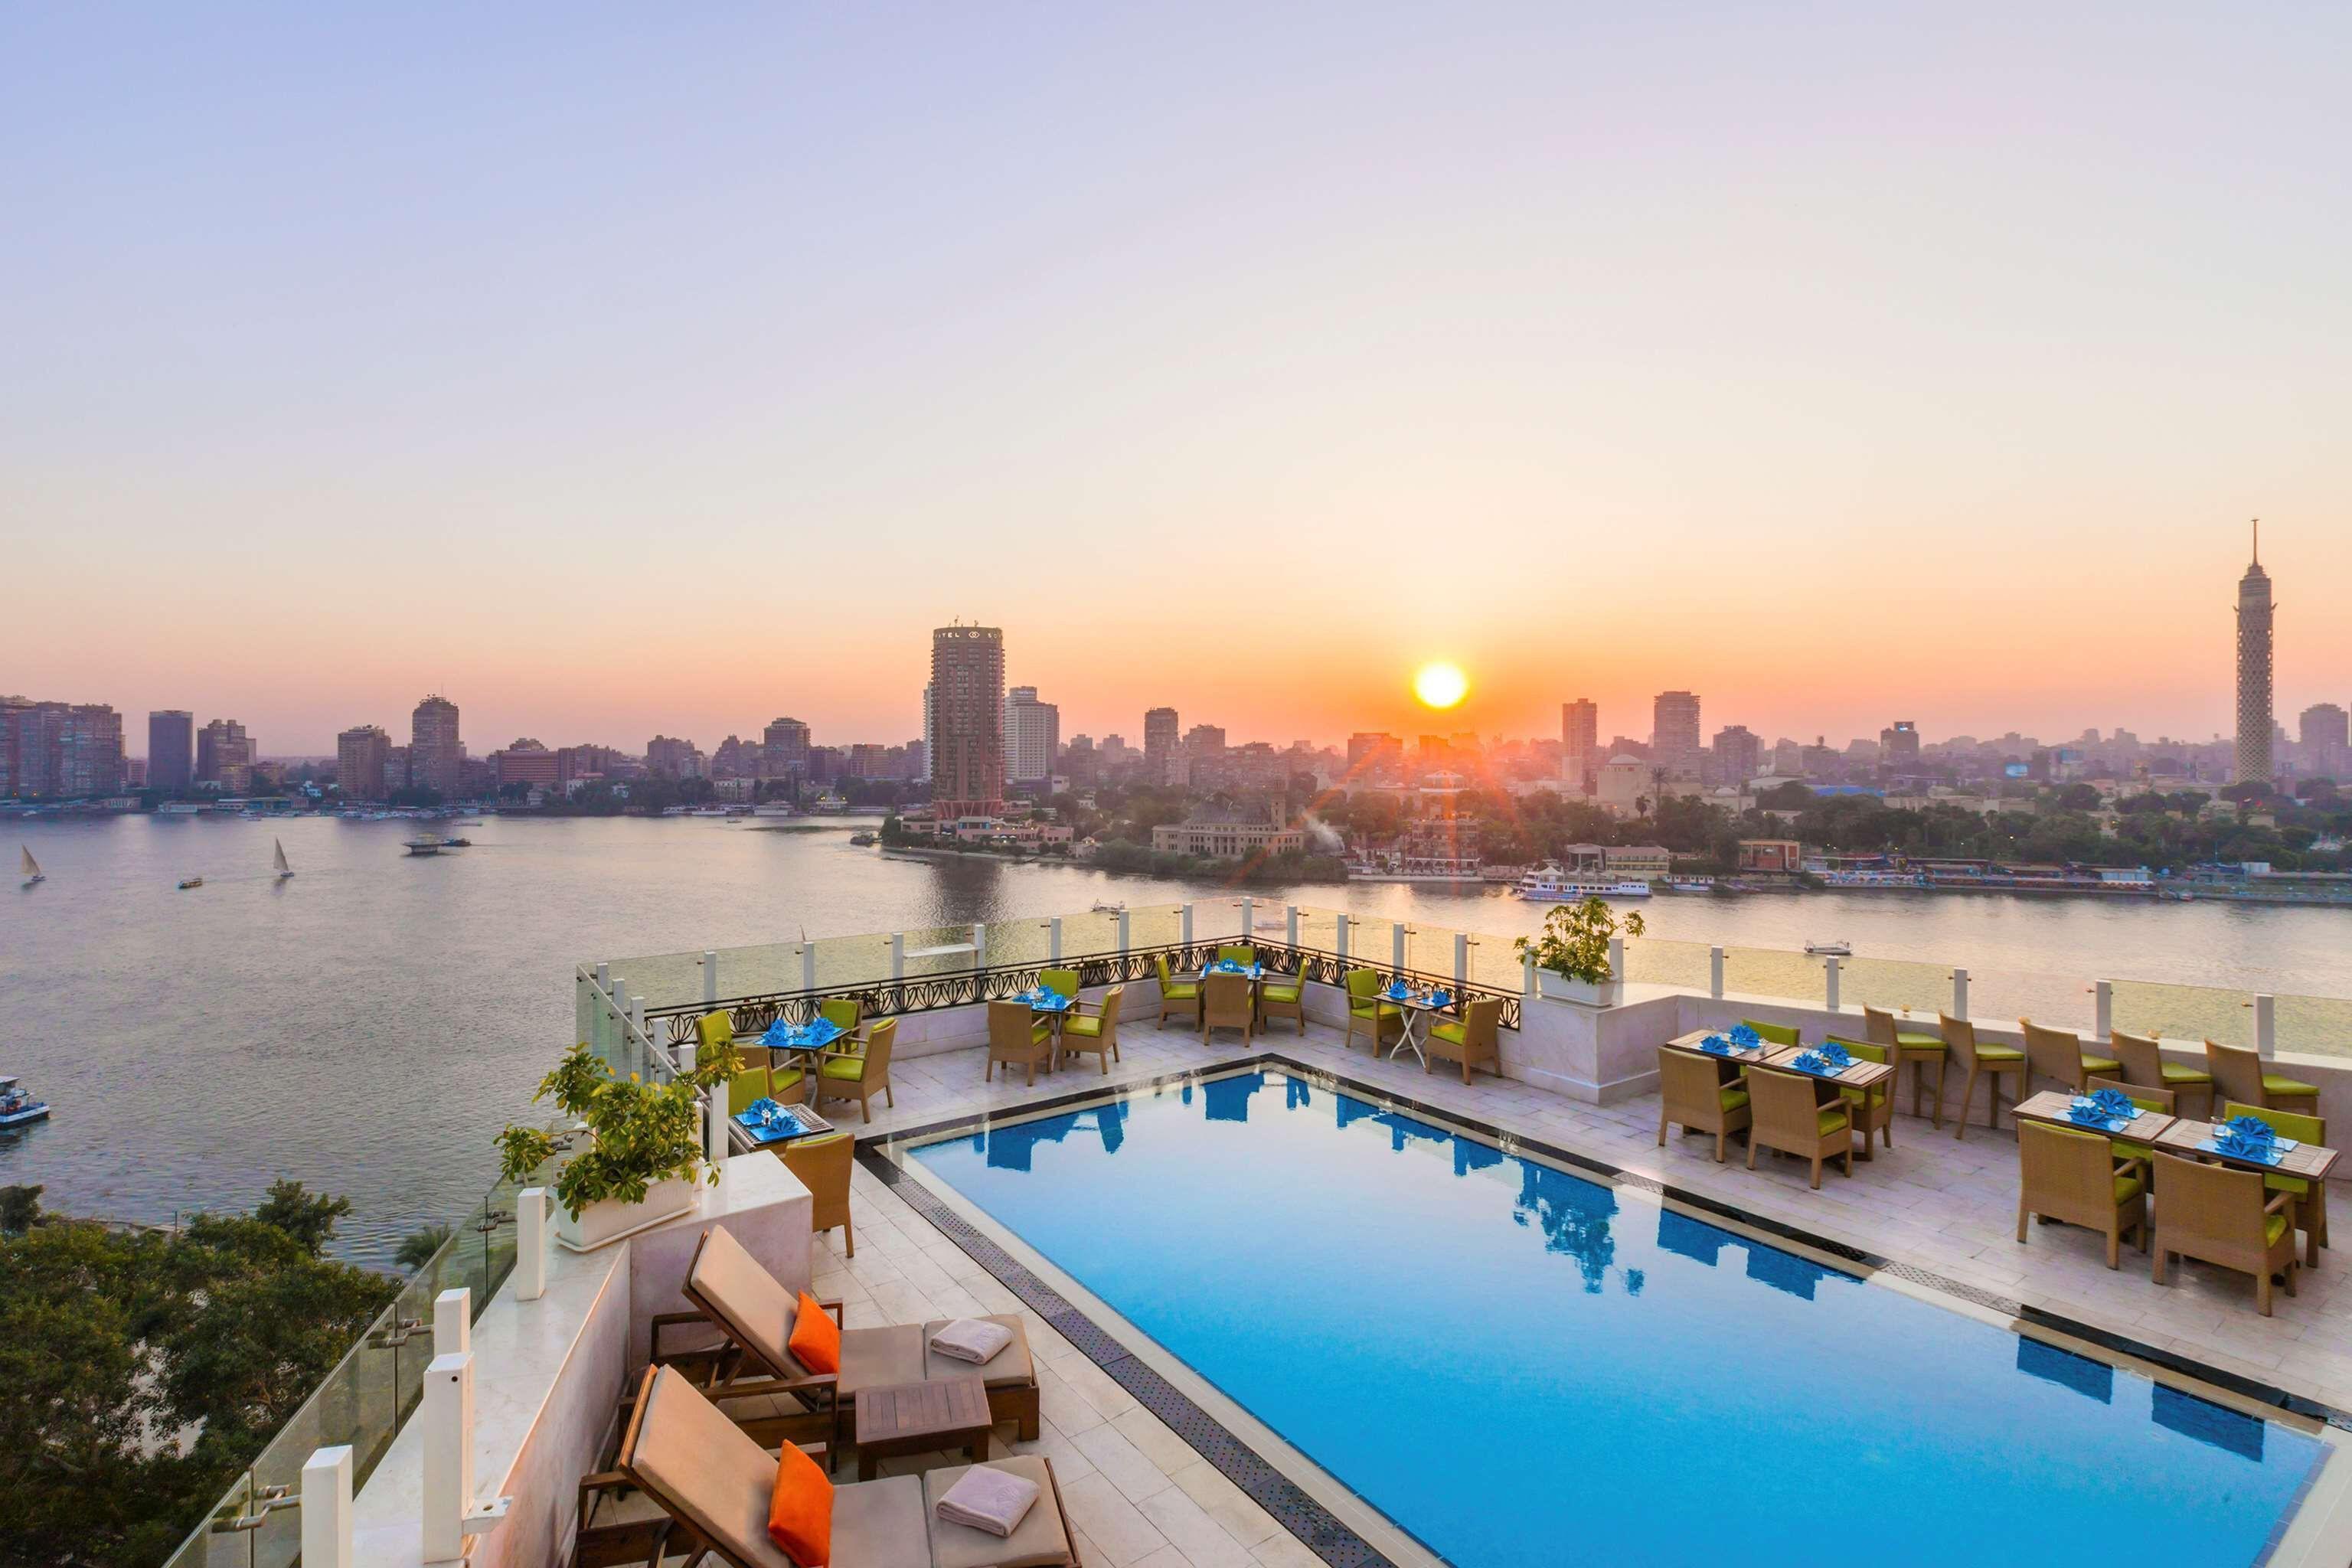 Courtesy of Kempinski Nile Hotel Cairo / Expedia